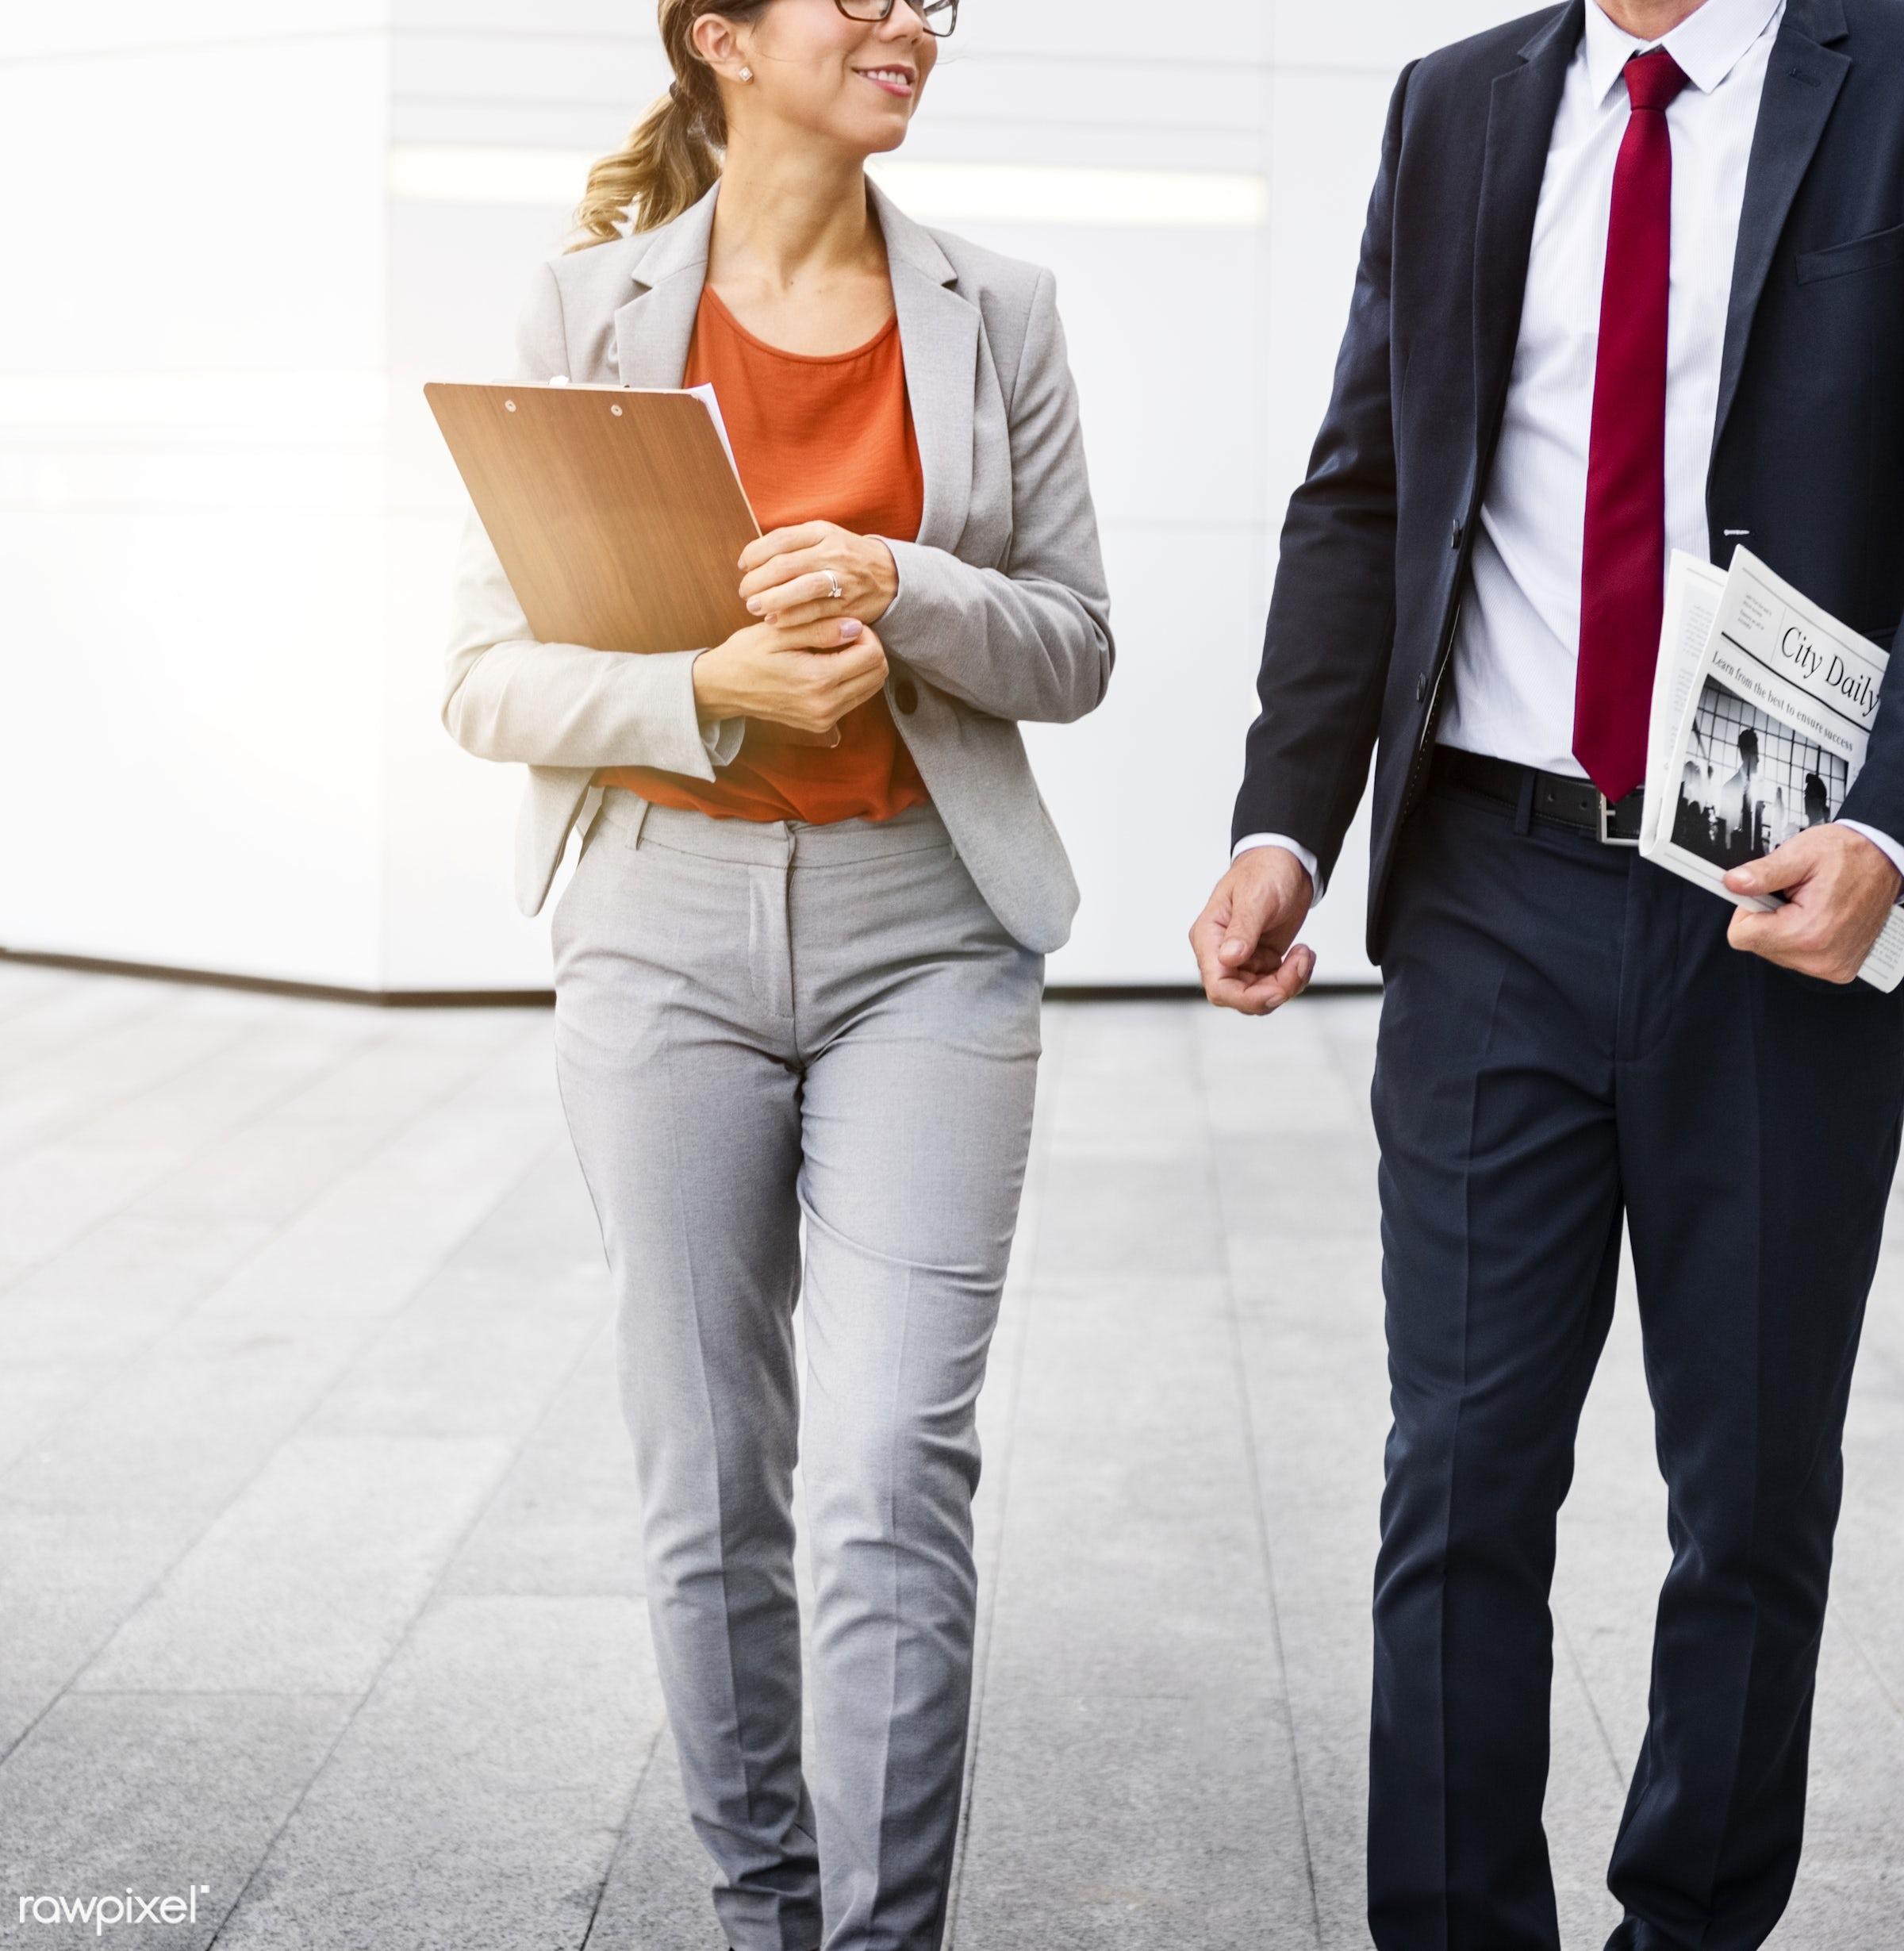 business, business people, businessman, businesswoman, city, city life, clipboard, colleague, communication, community,...